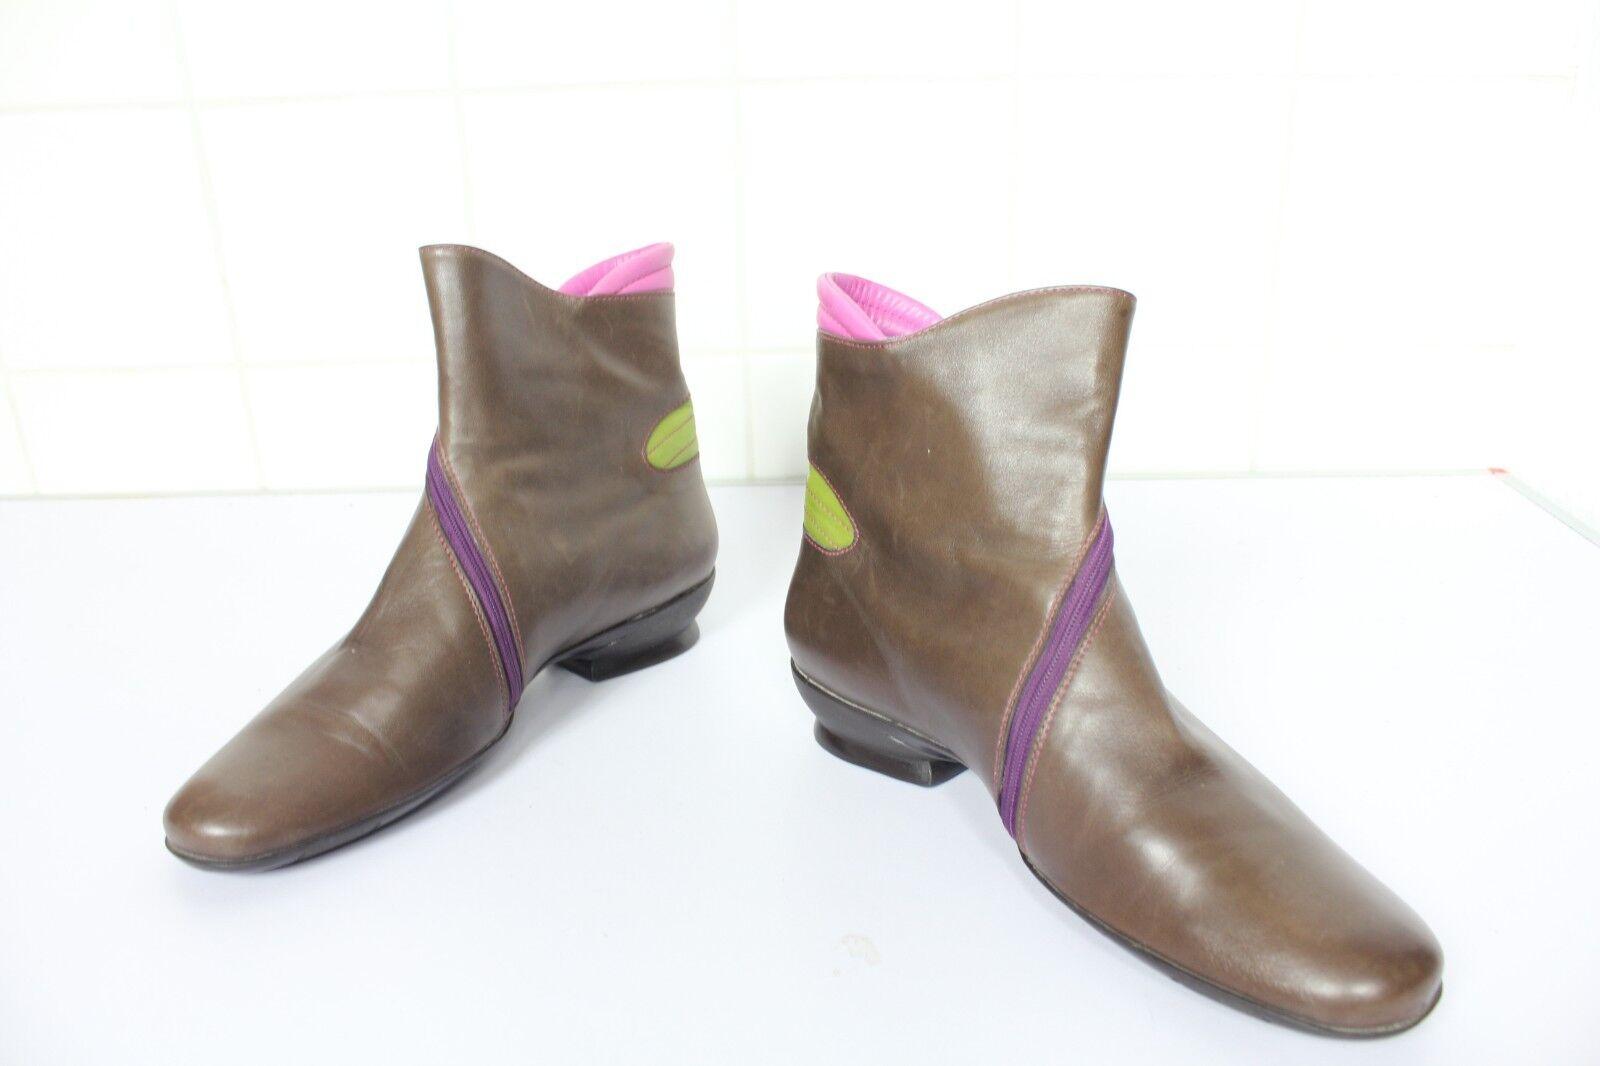 Everybody Elegante Stiefeletten Boots Echtleder Mehrfarbig Eu 40 made in